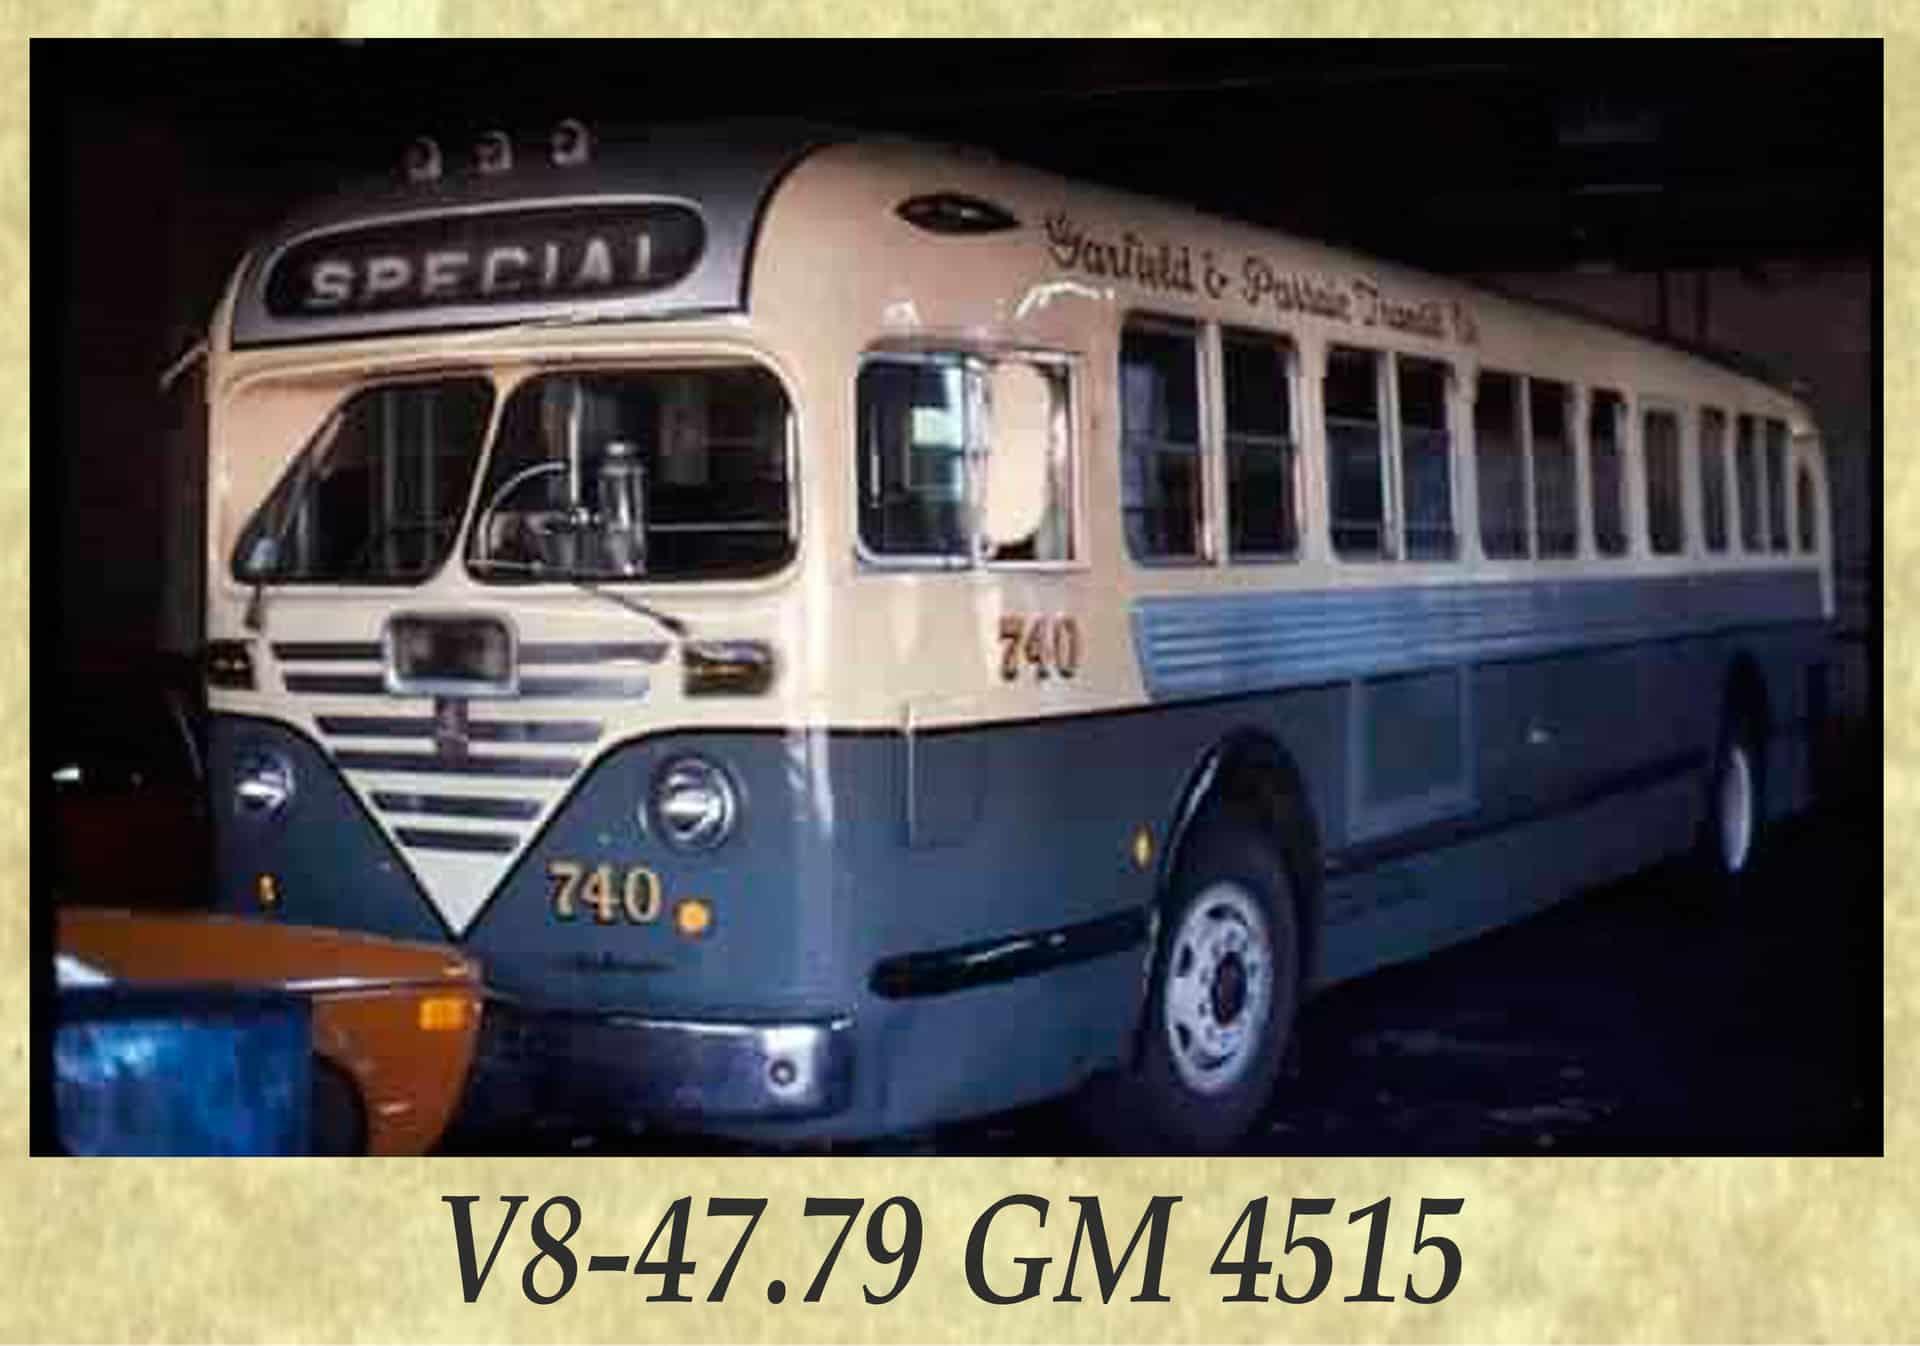 V8-47.79 GM 4515